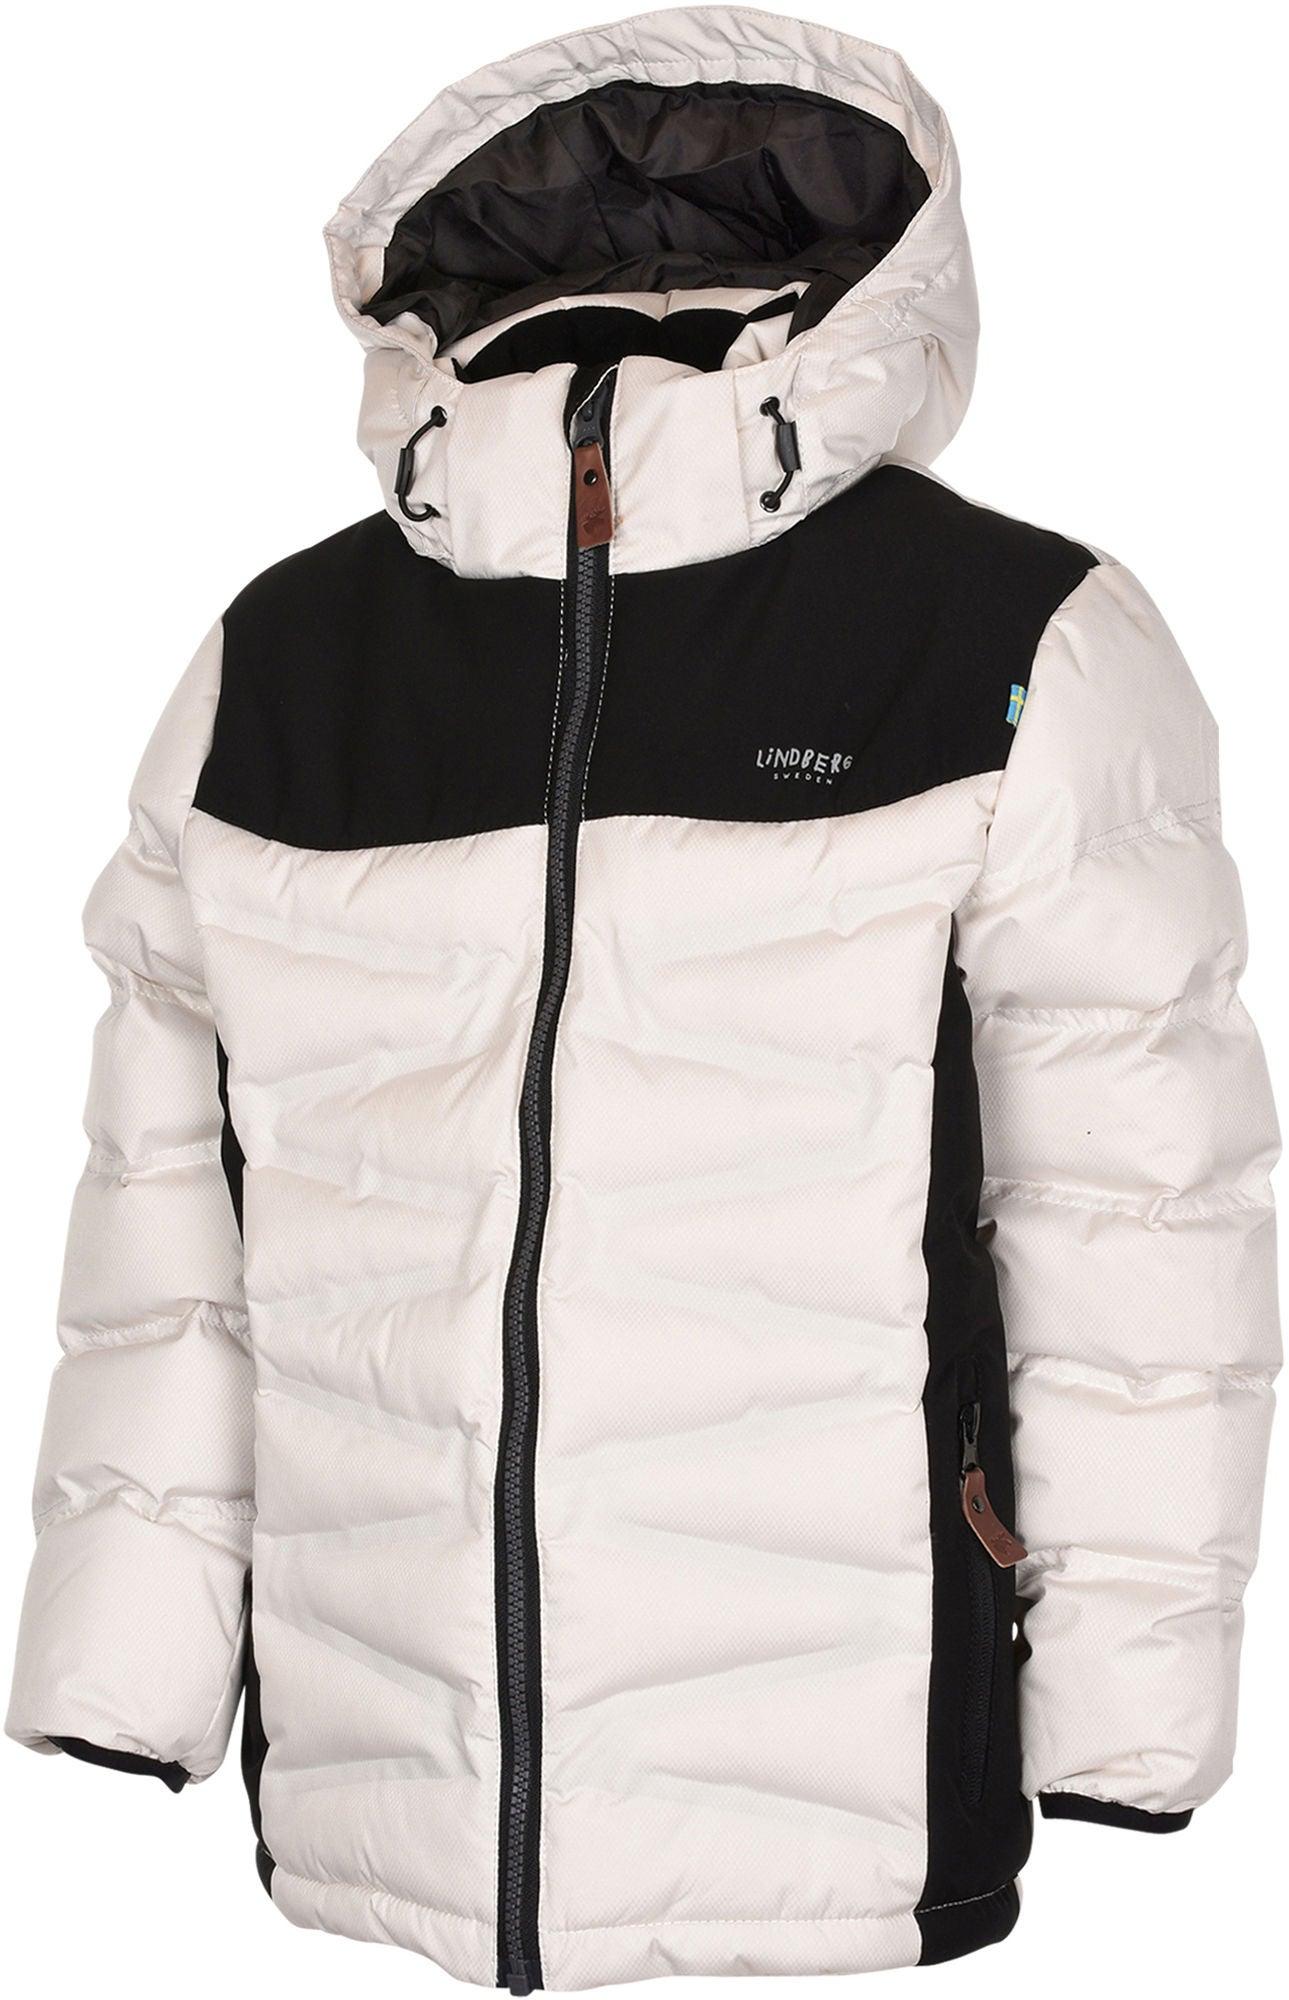 Osta Lindberg Zermatt Takki 3bae96eafb